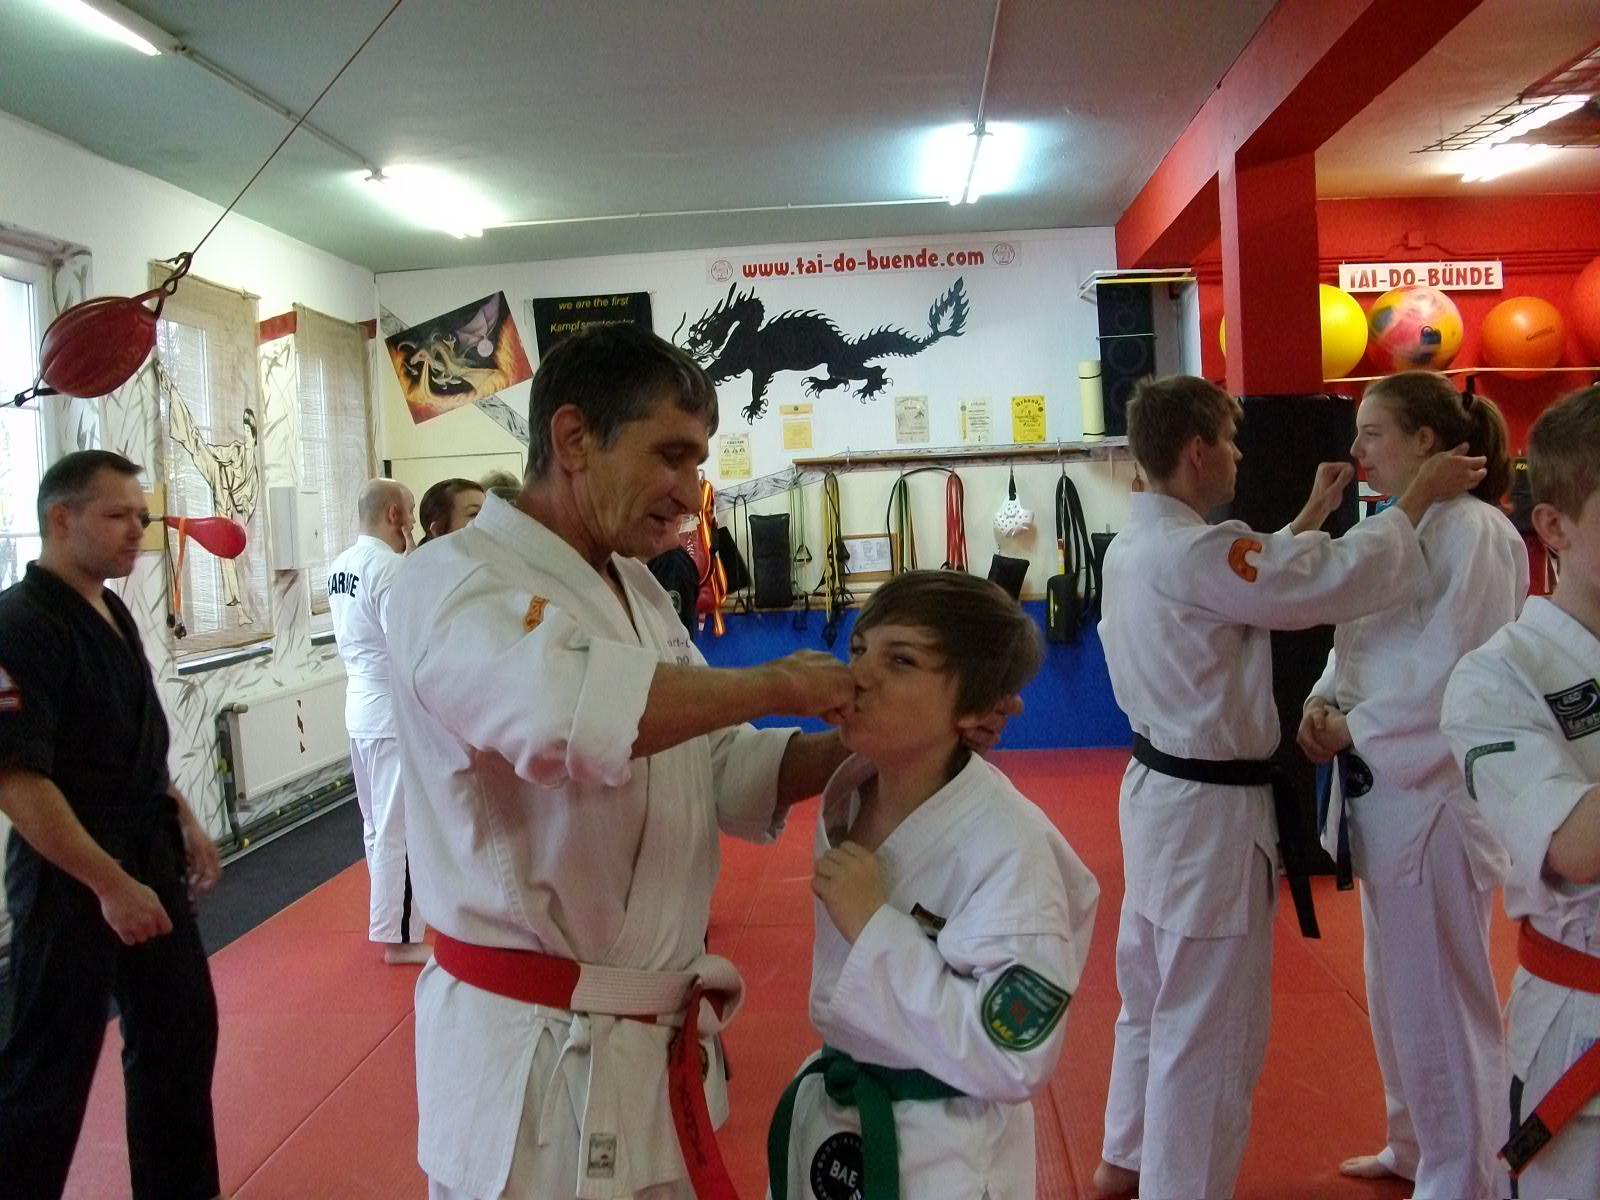 Auf Tuchfühlung mit Kyusho-Jitsu